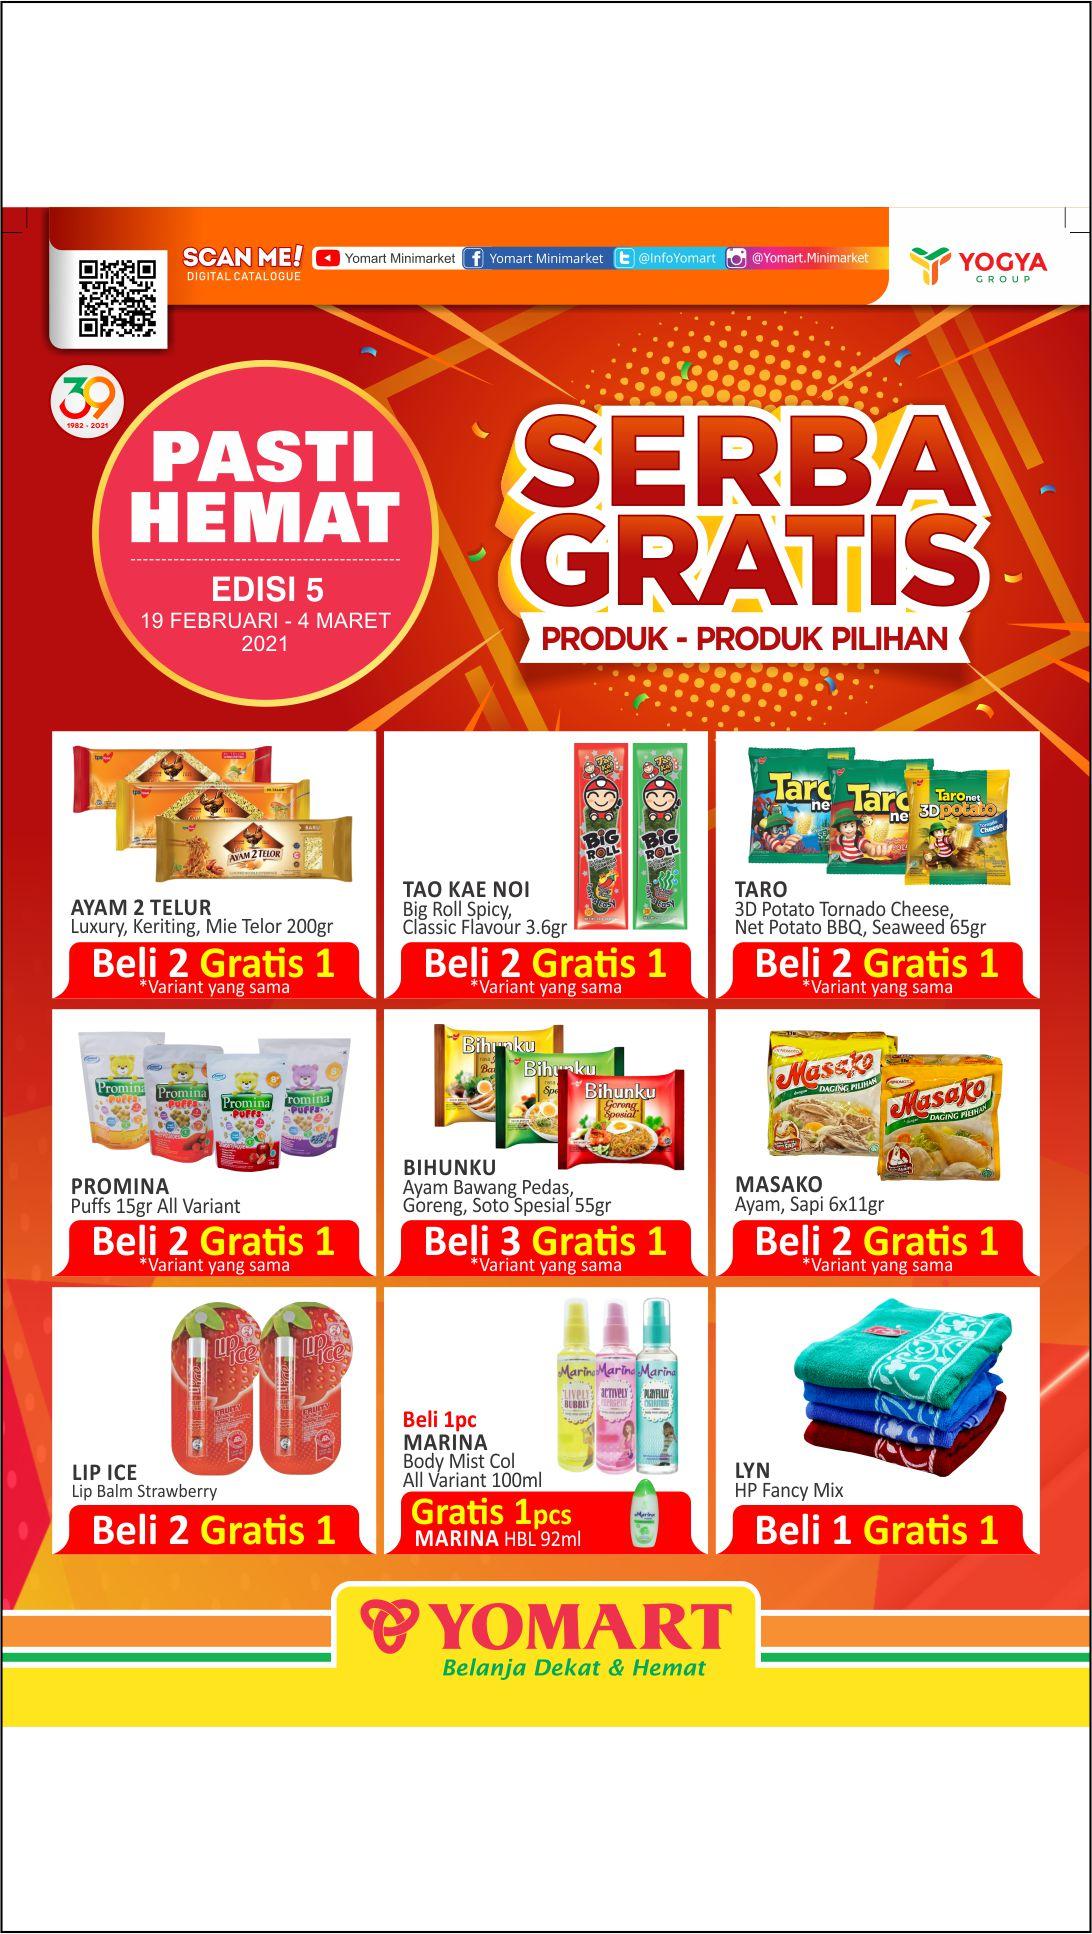 Katalog Yomart Minimarket Promo Mingguan periode 19 Februari - 04 Maret 2021